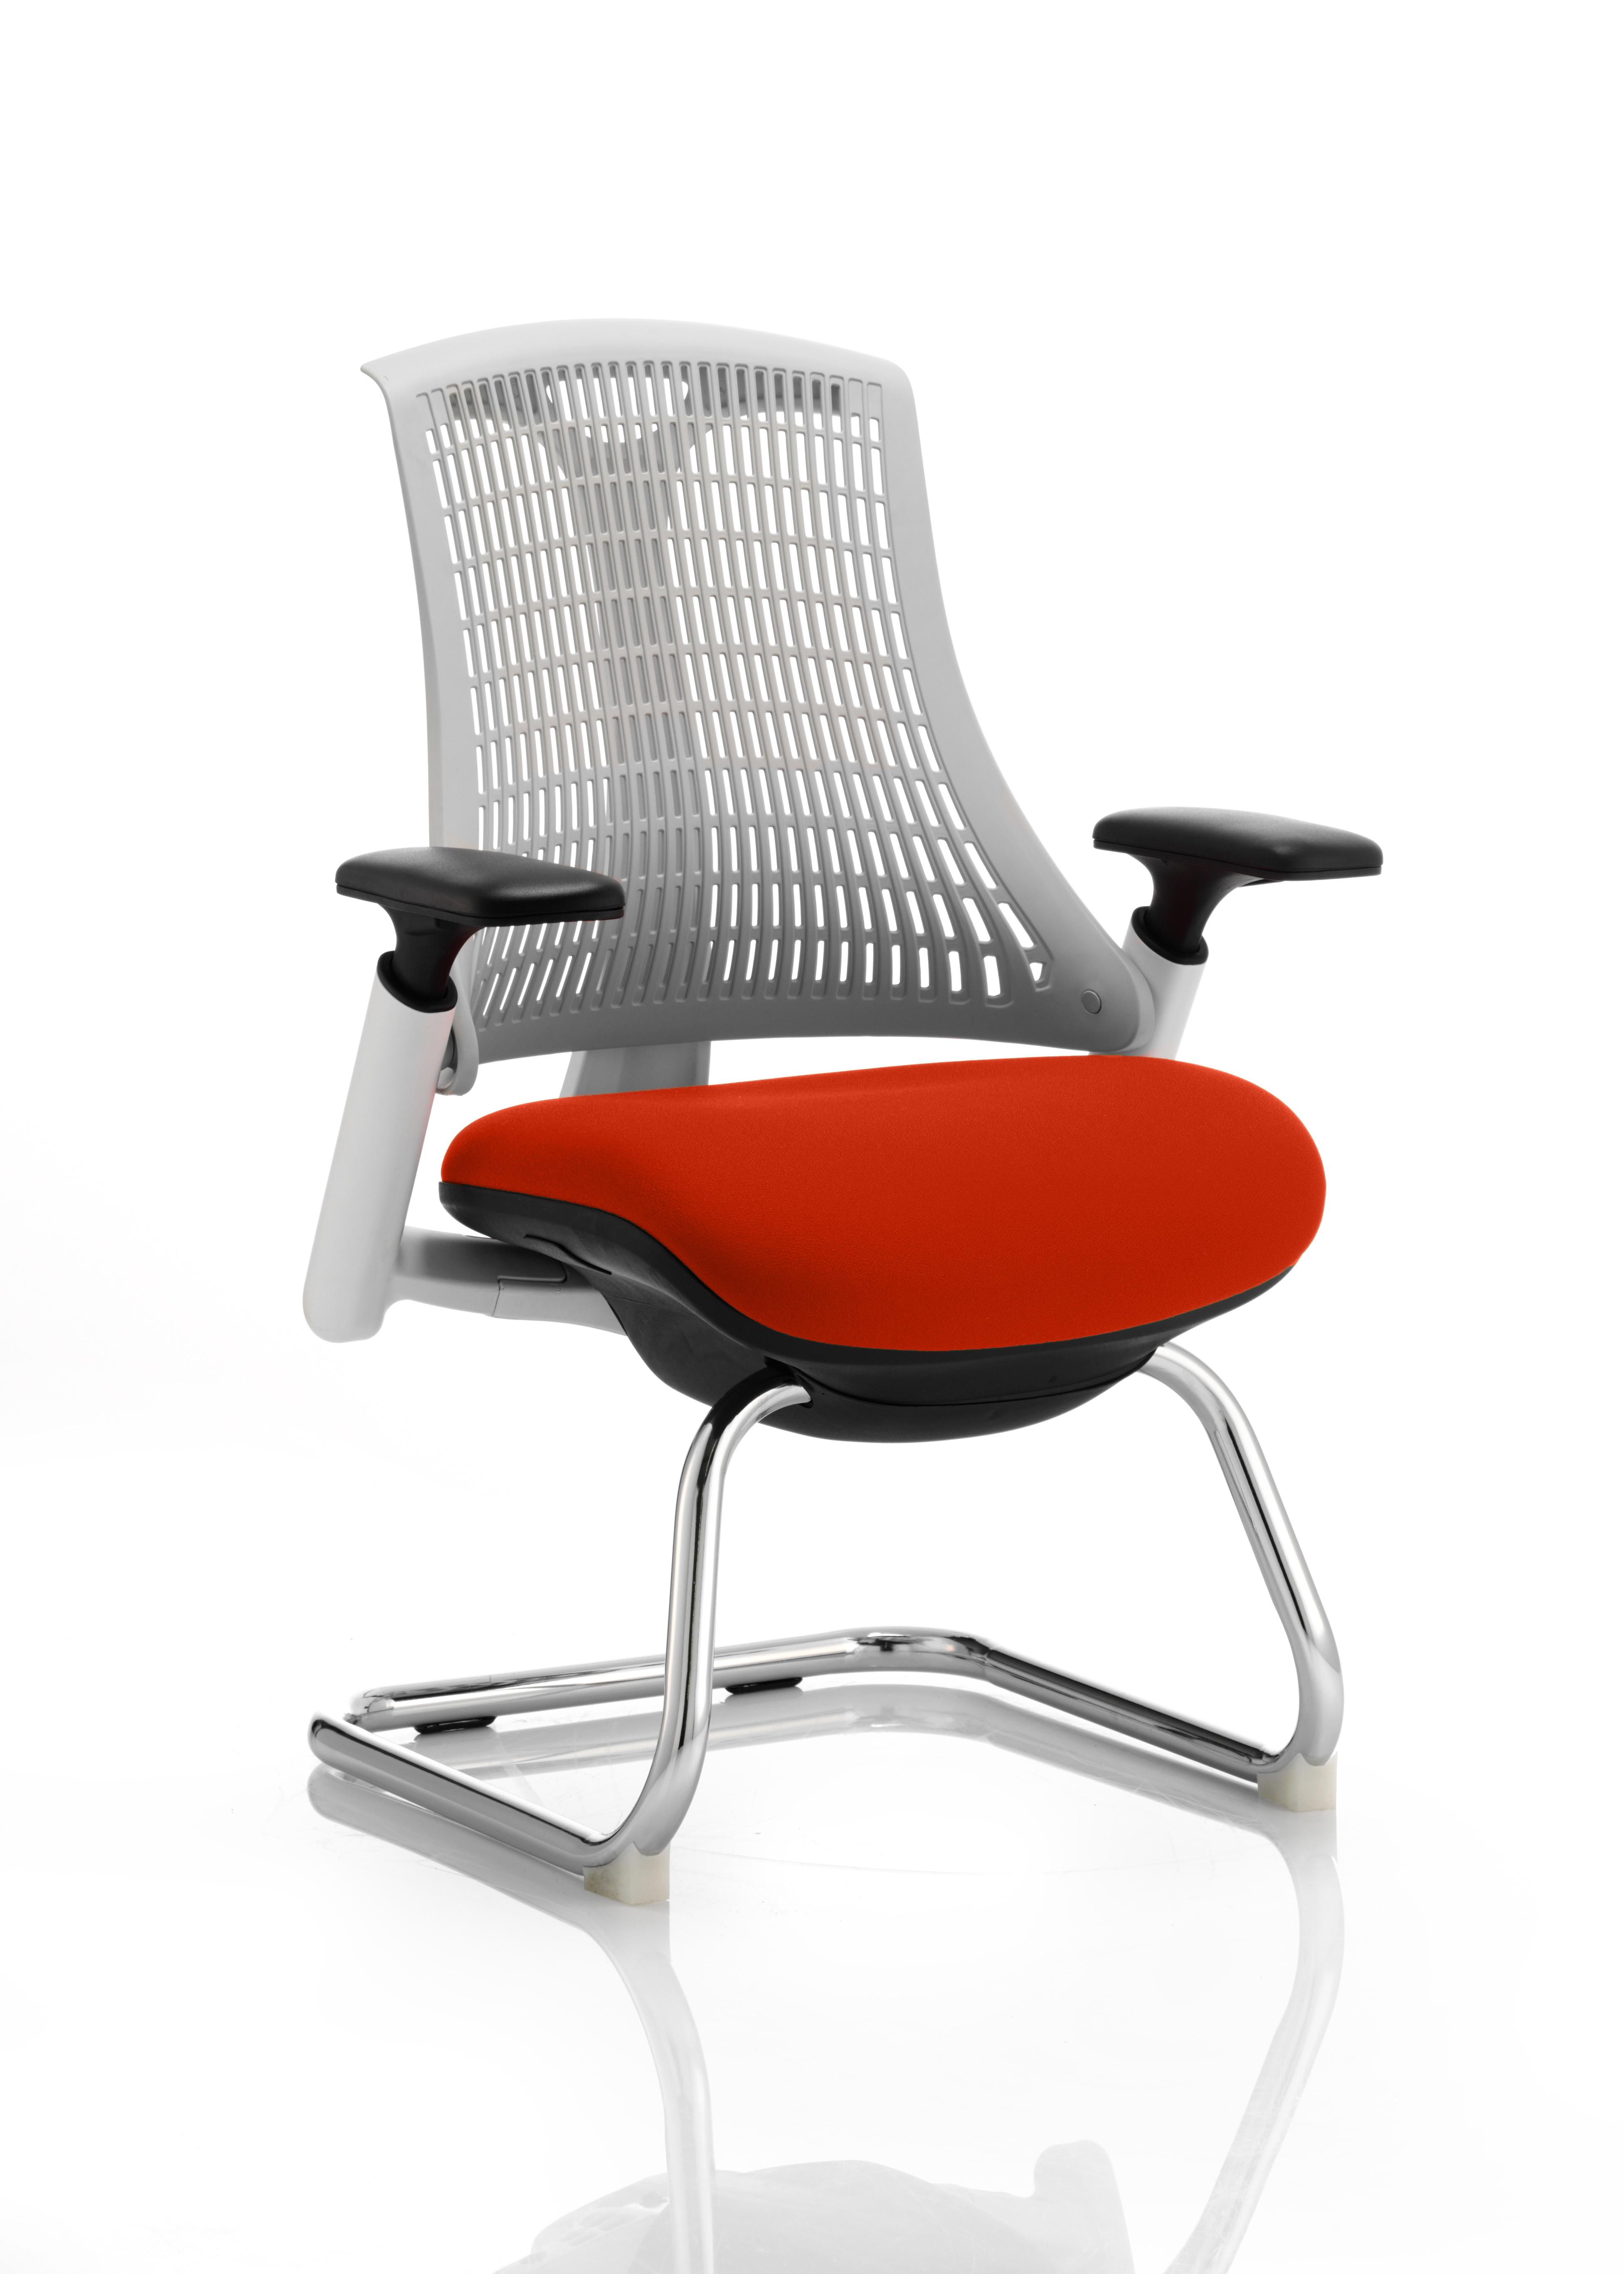 Flex Cantilever Chair White Frame White Back Bespoke Colour Seat Tabasco Red